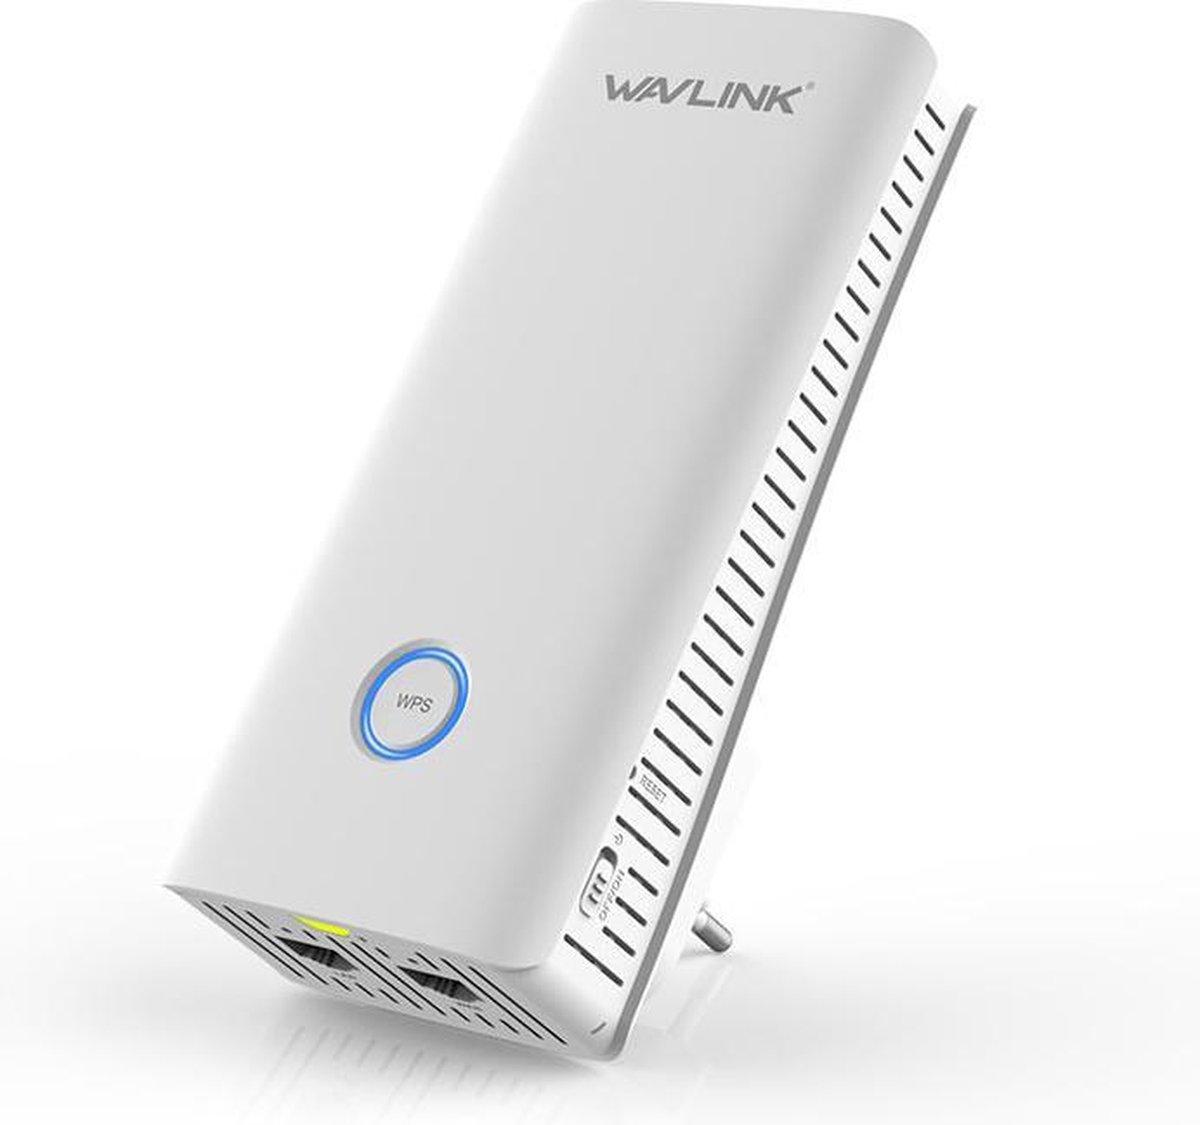 Wavlink AERIAL MAX - AC2100 MU-MIMO Draadloze Router / AP / Range Extender met Dual Giga LAN